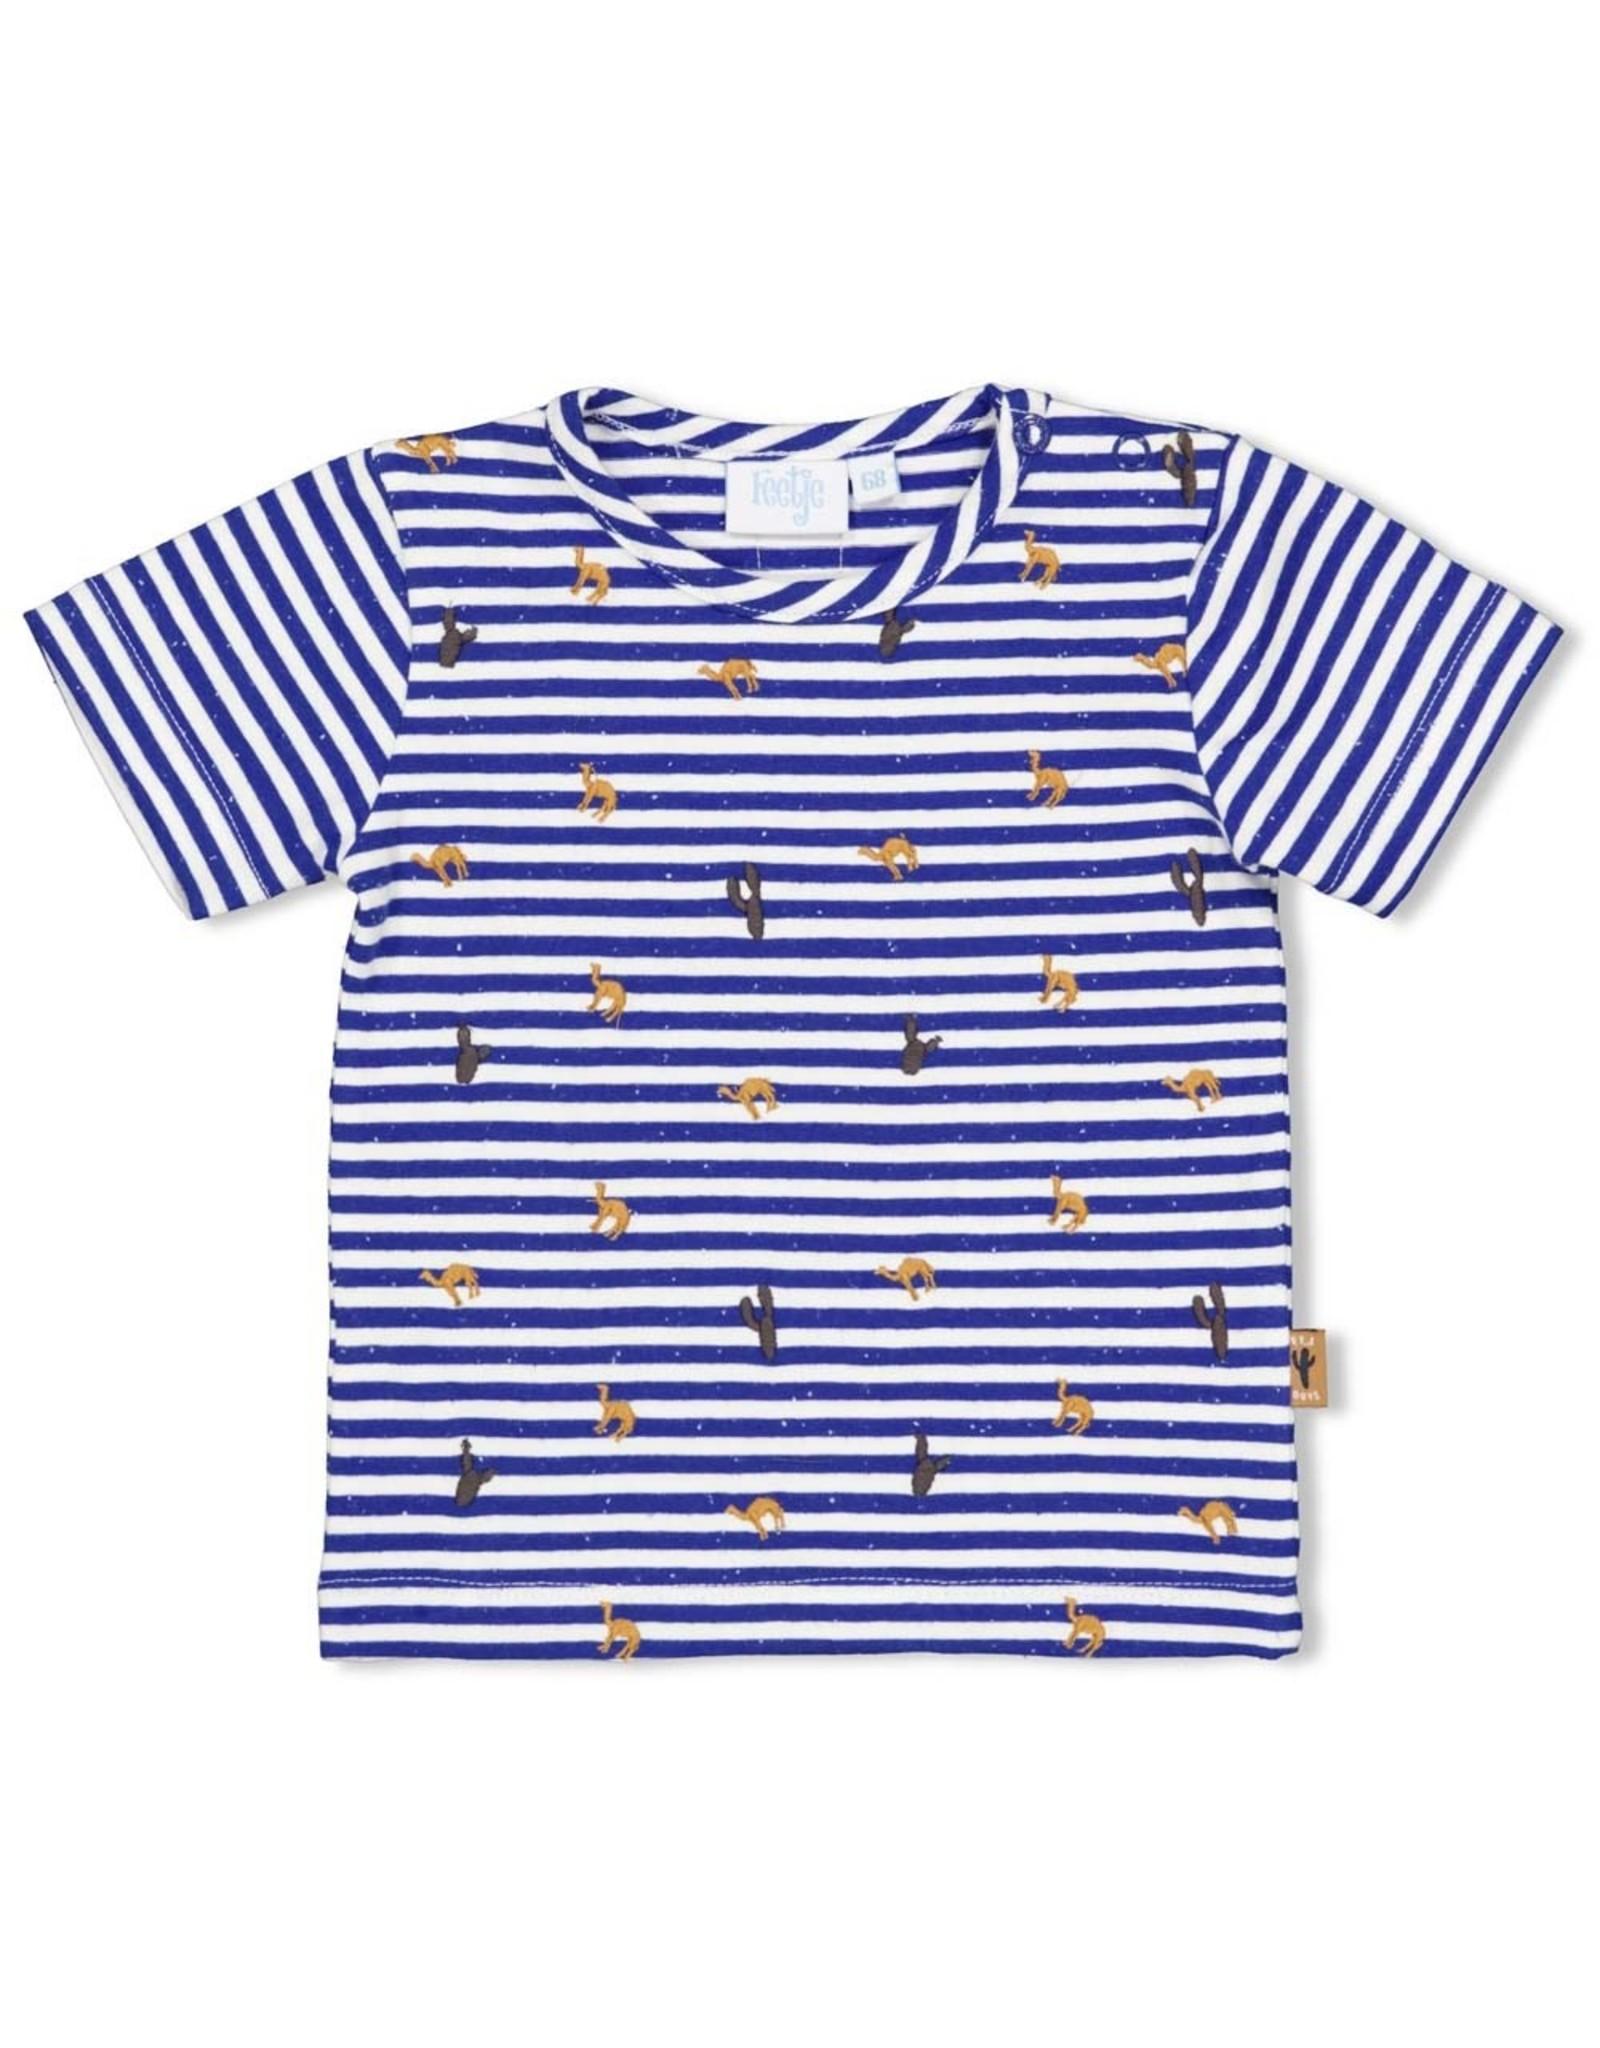 Feetje T-shirt streep - Looking Sharp